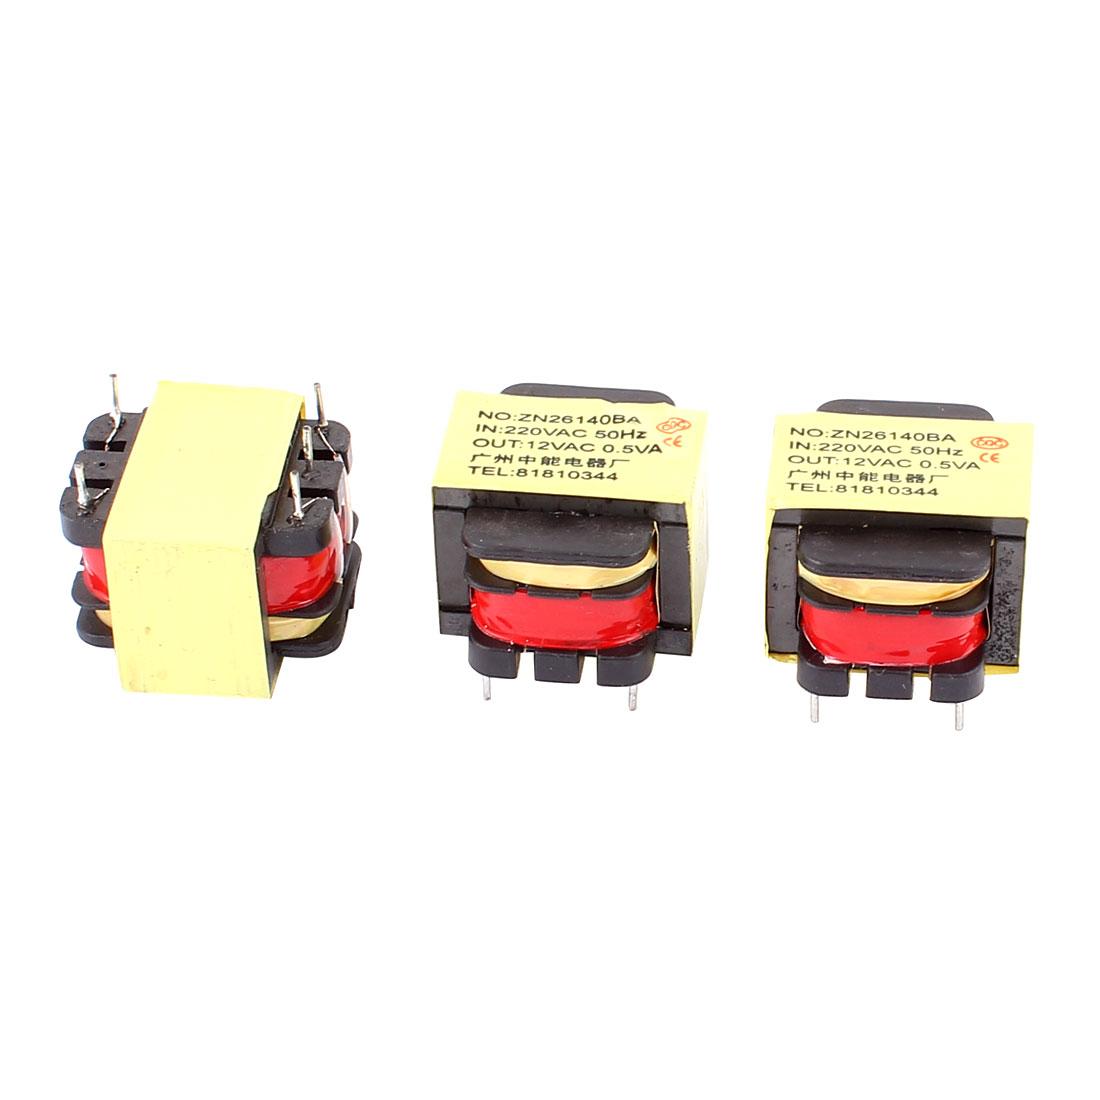 3Pcs 220V Input 12V 0.5VA Output Yellow Red Ferrite Core Power Transformer w 5 Terminals